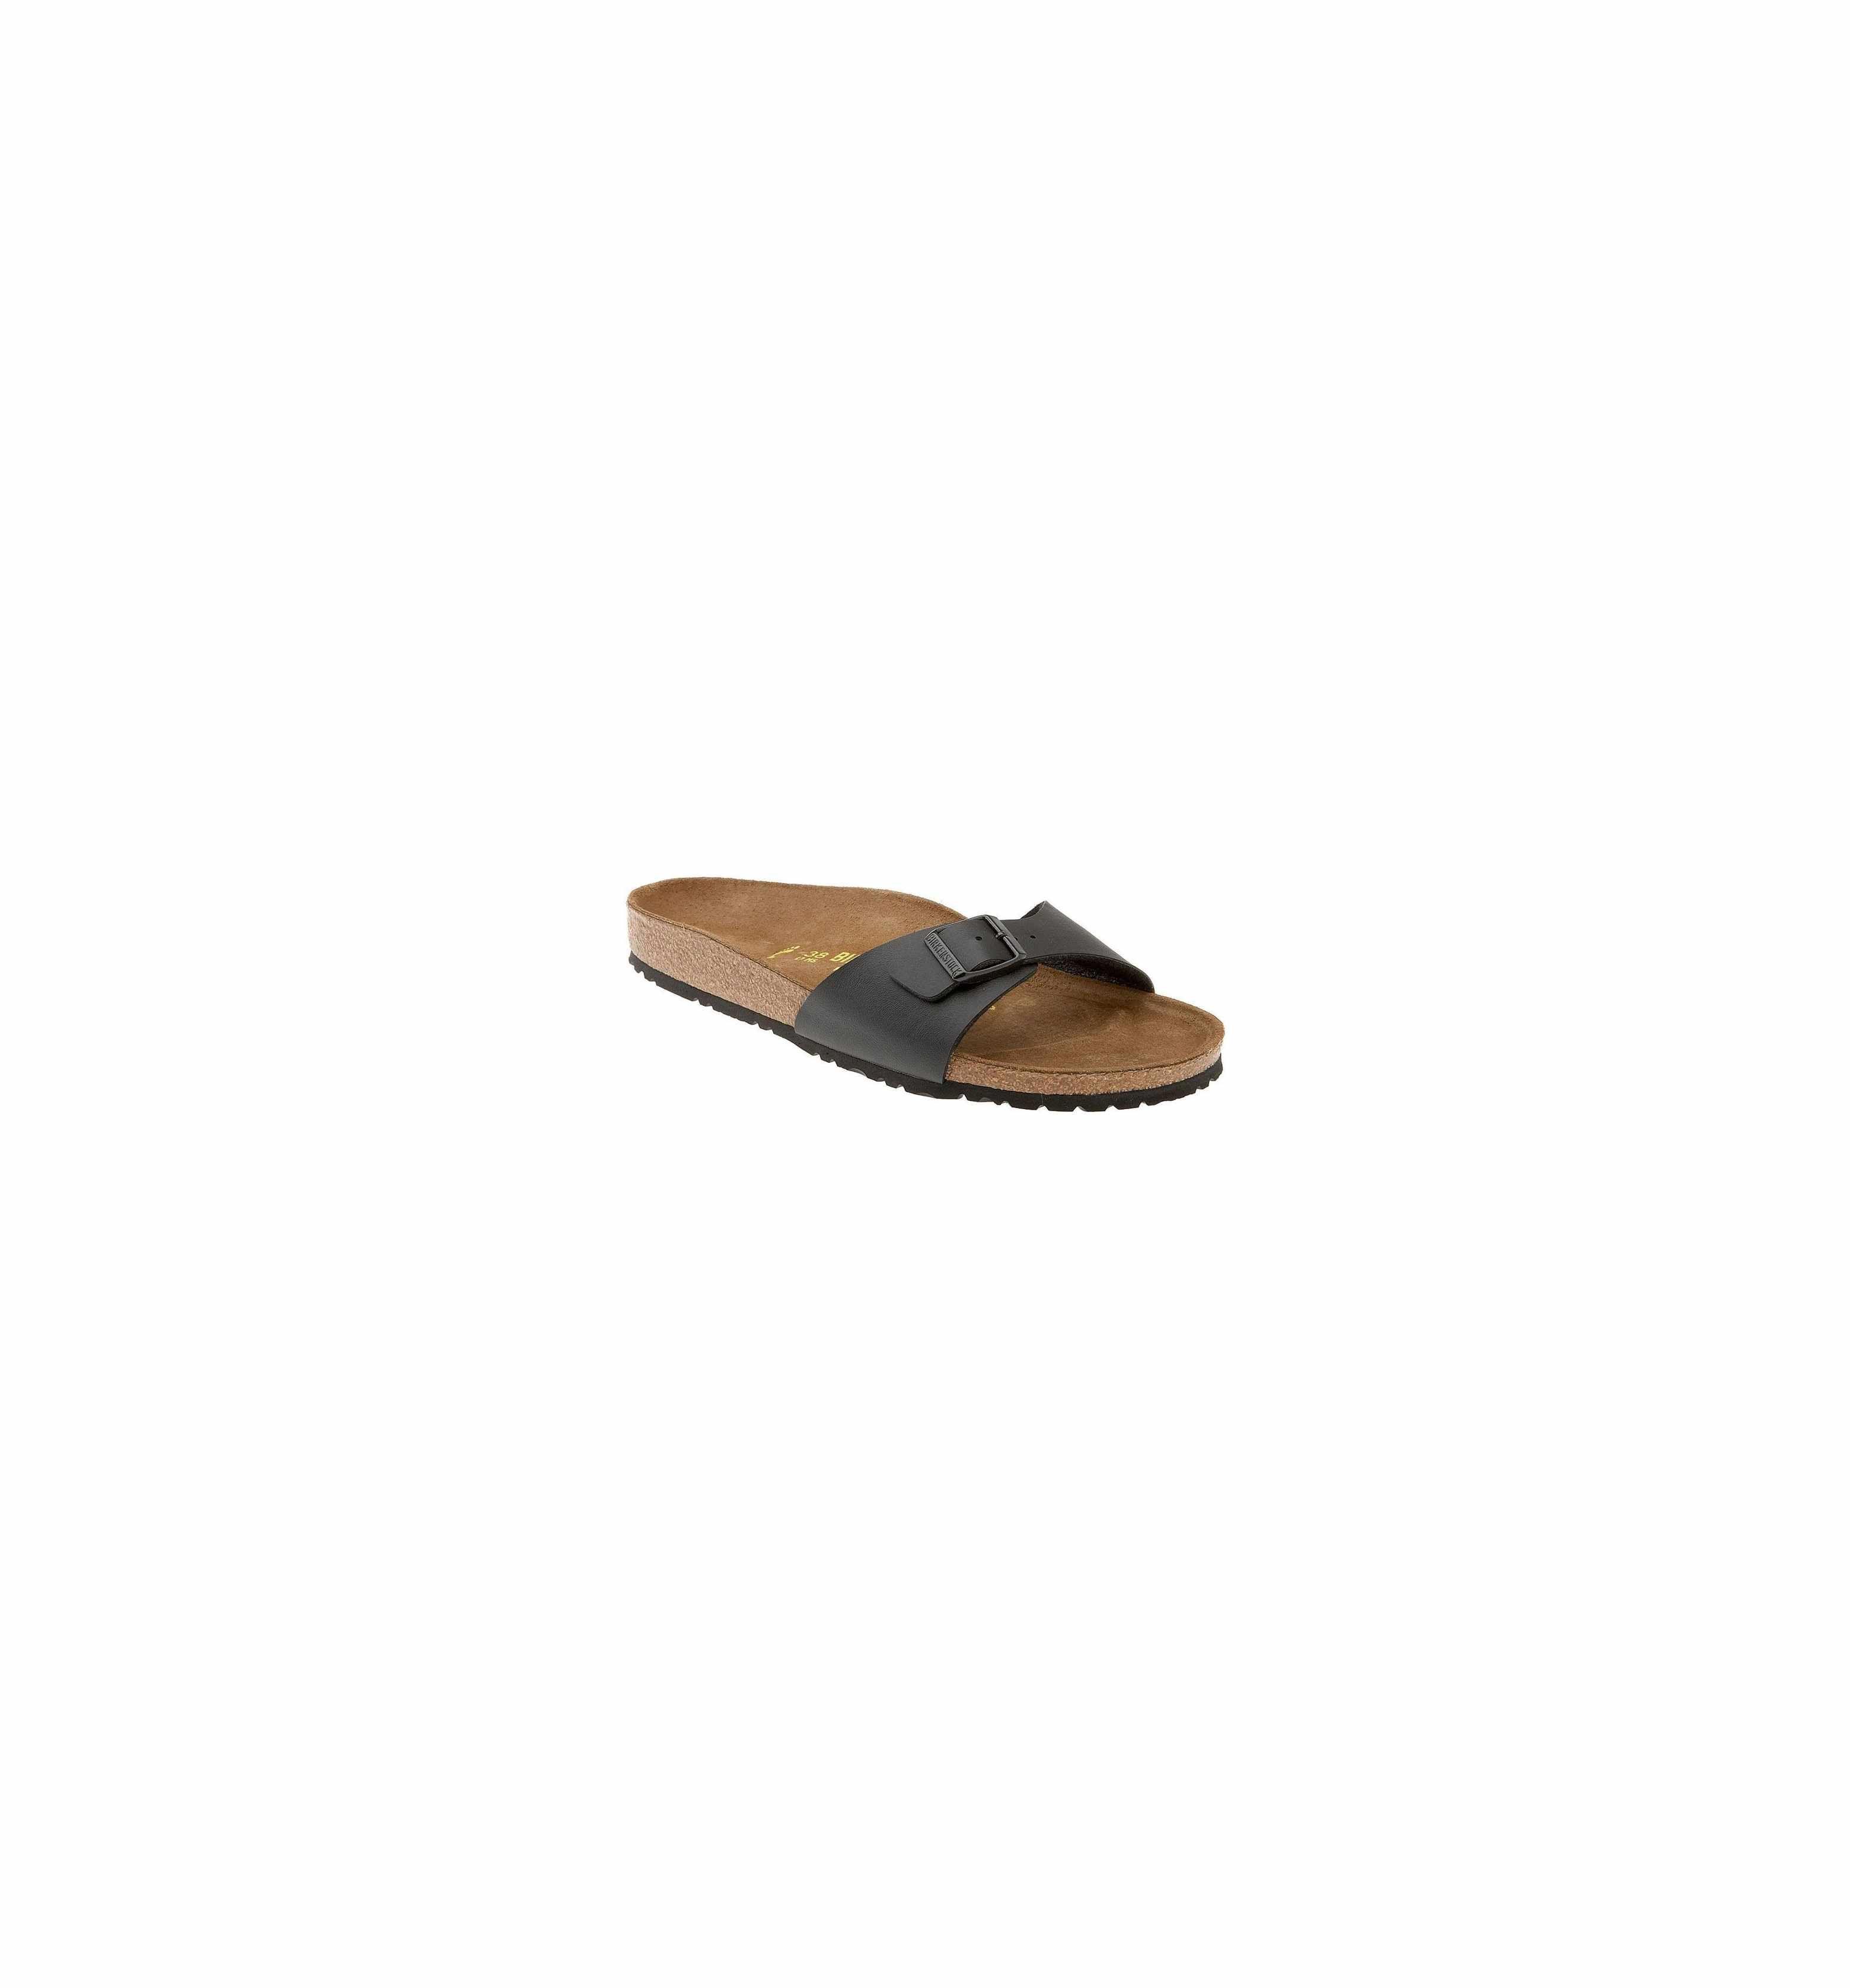 Main Image Birkenstock 'Madrid' BirkoFlor™ Sandal